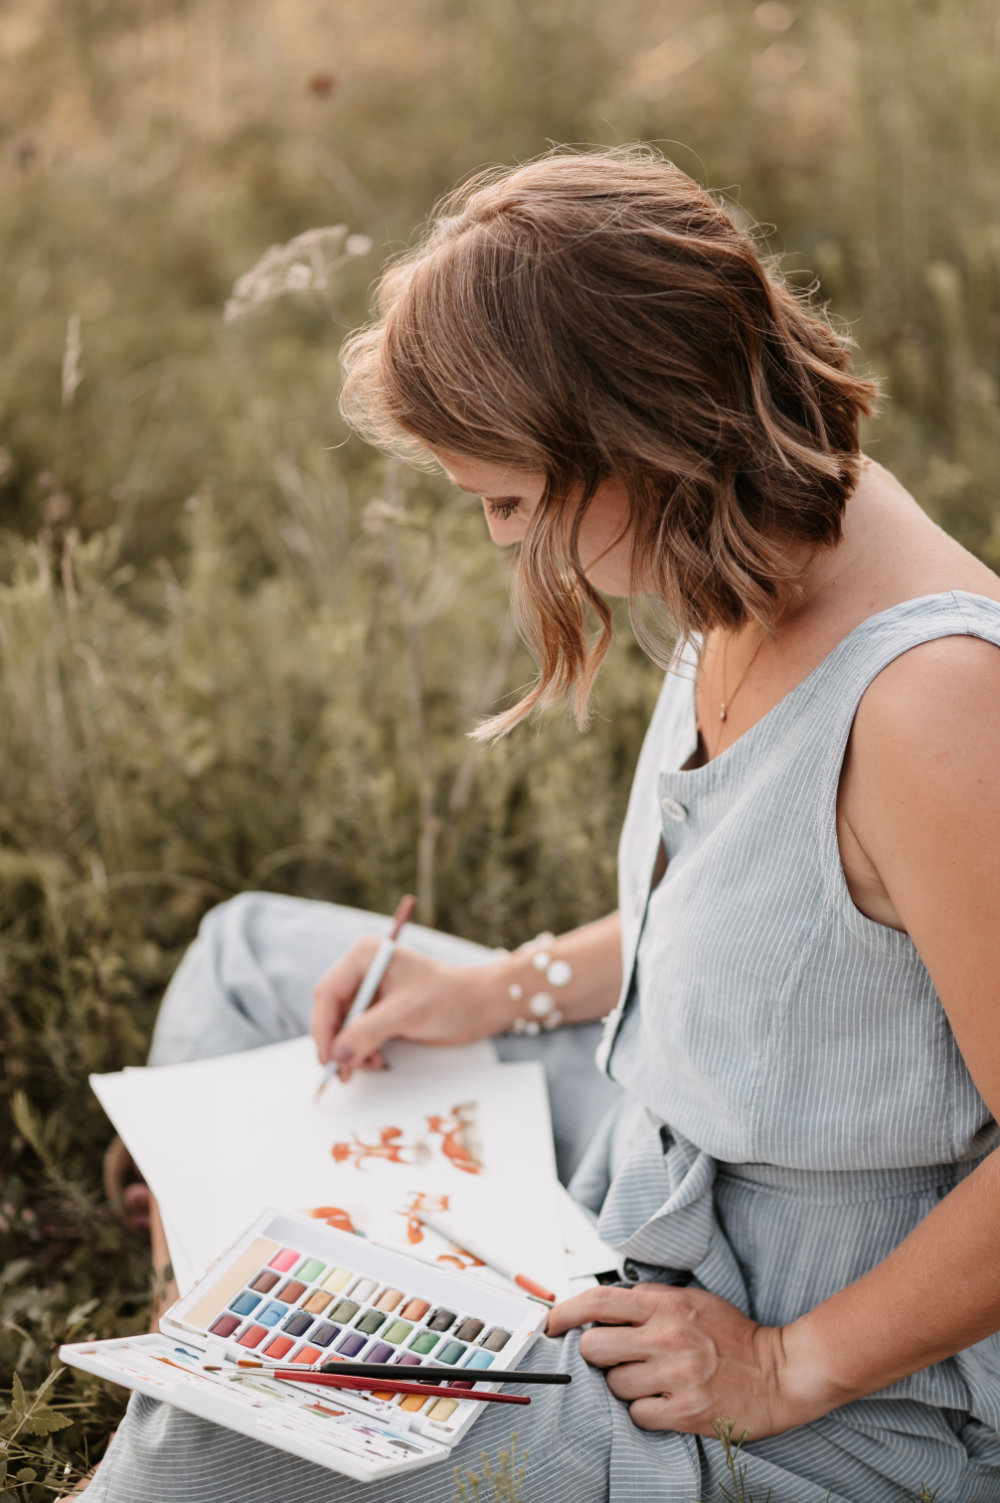 Sabrina Sebald Individuelle Papeterie Illustratorin Aquarelldesign